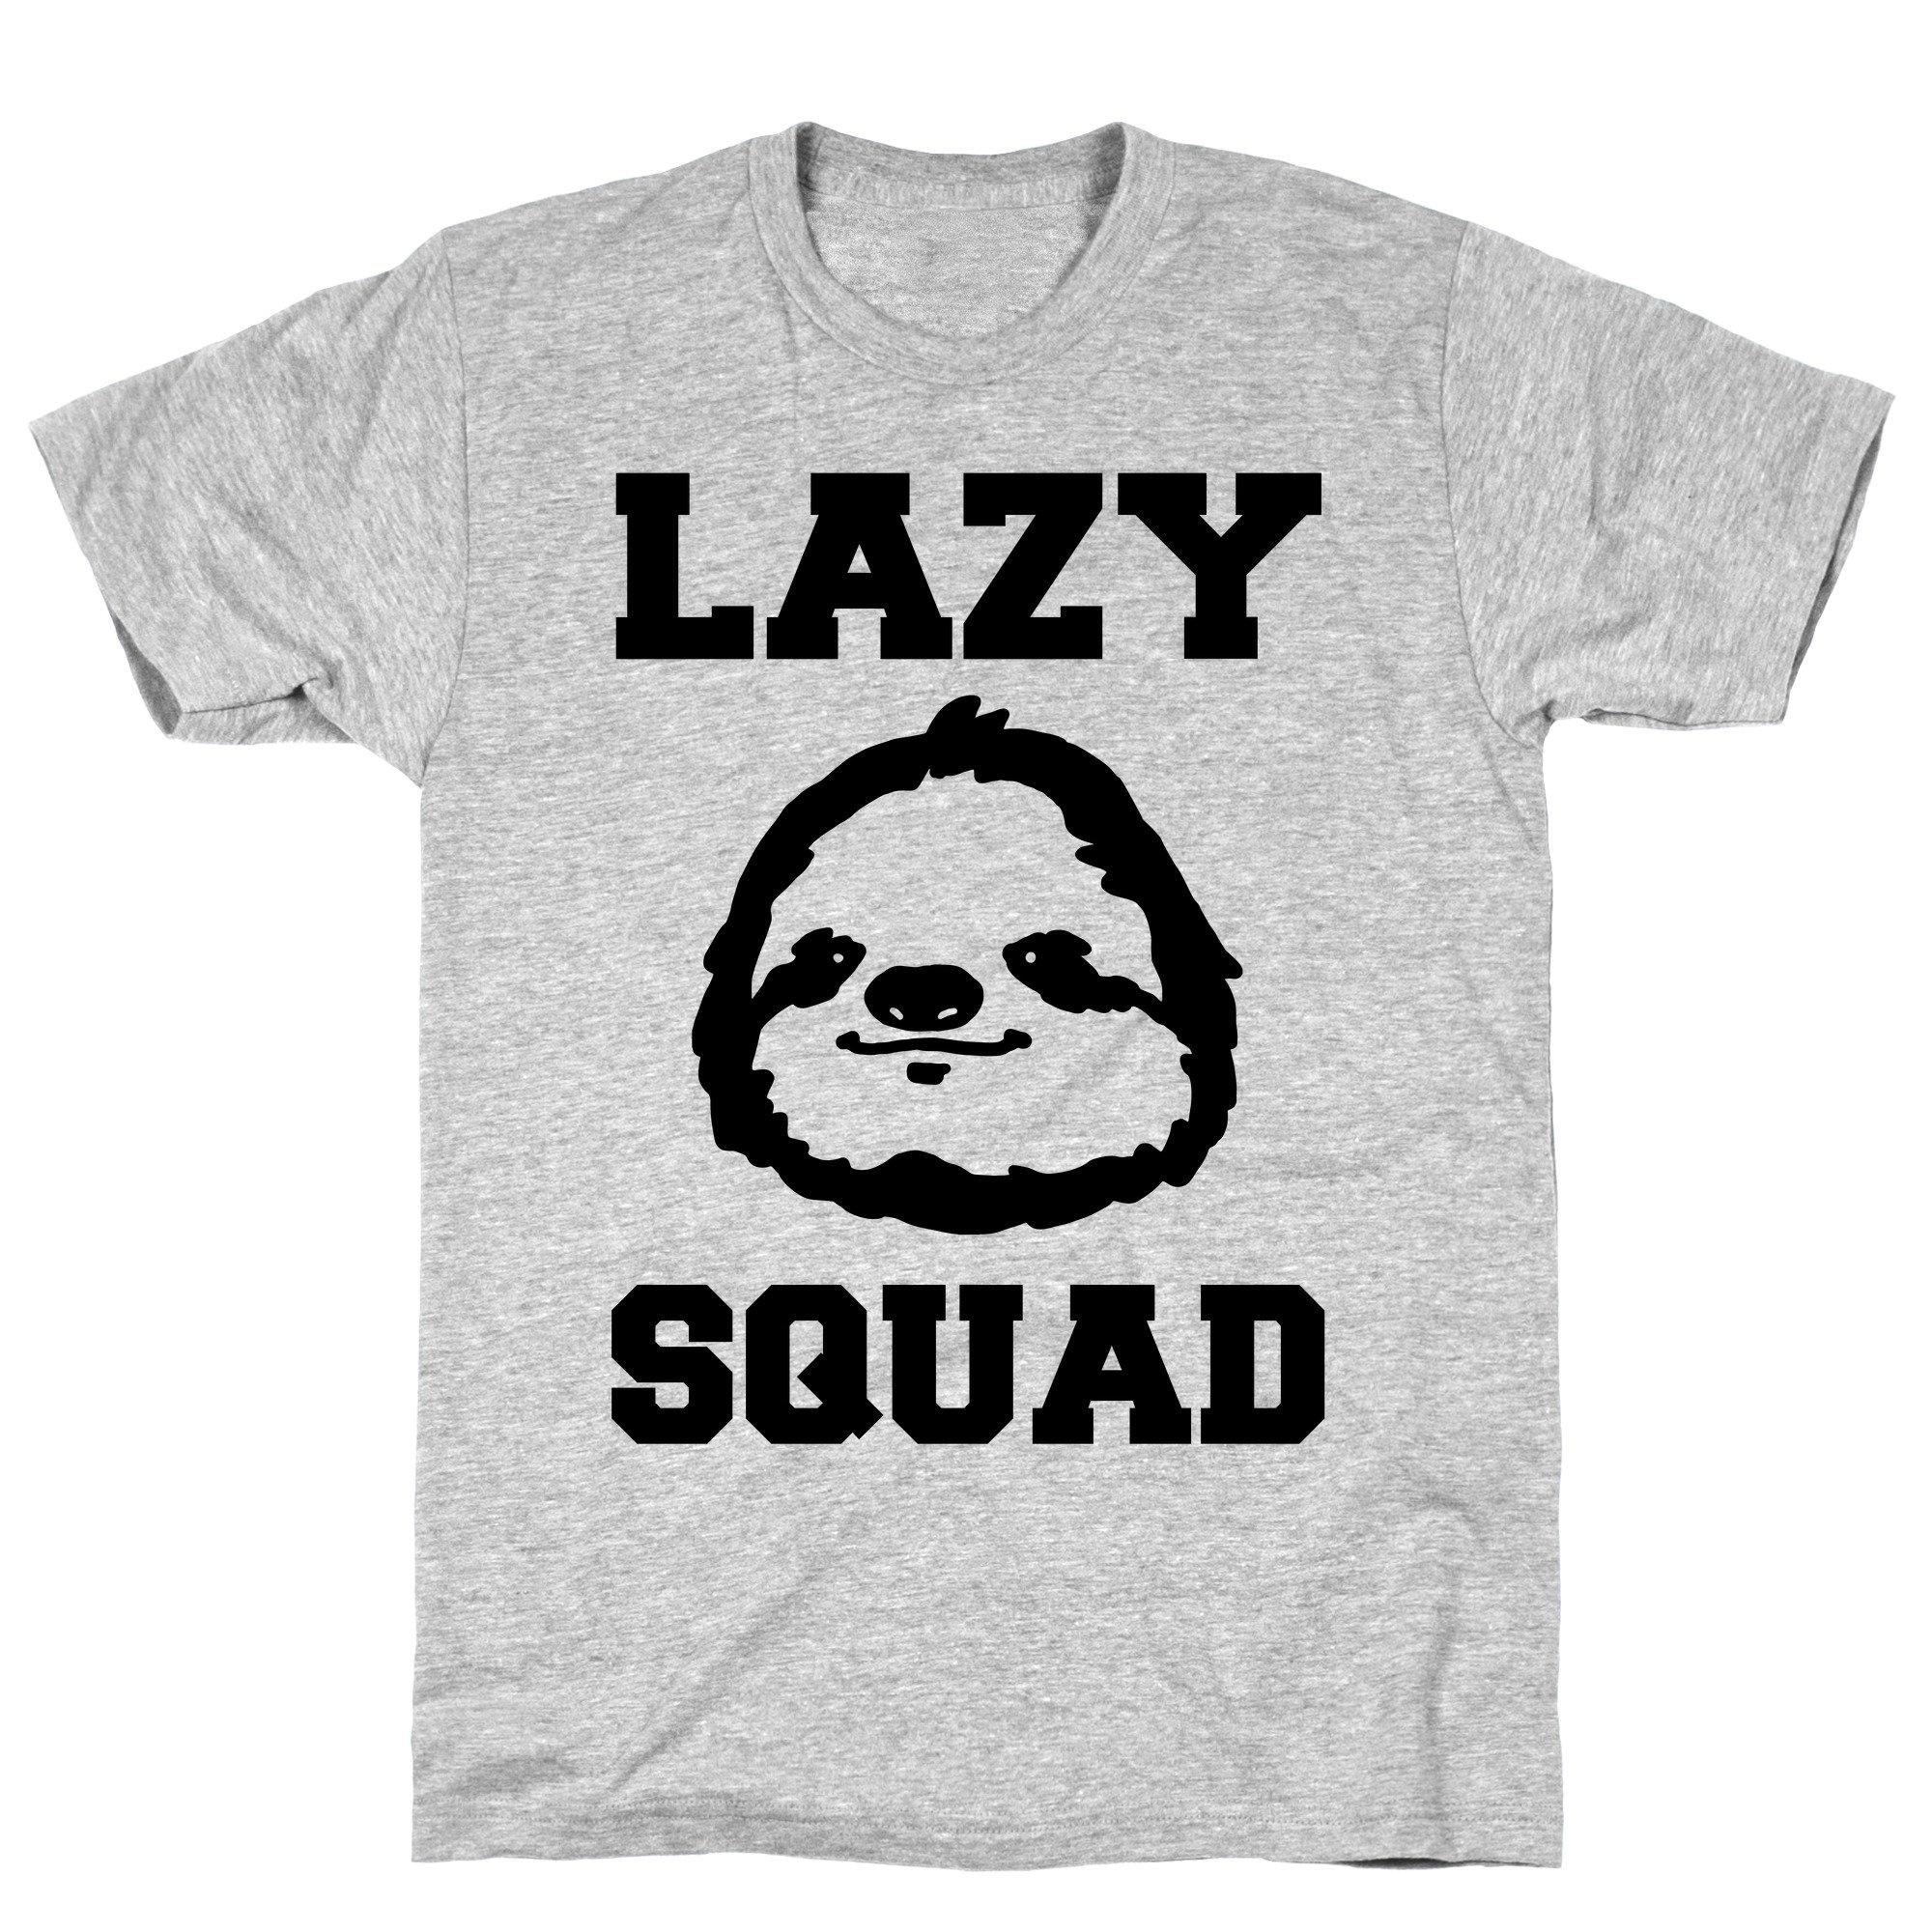 Lazy Squad Athletic Gray Tee 3505 Shirts